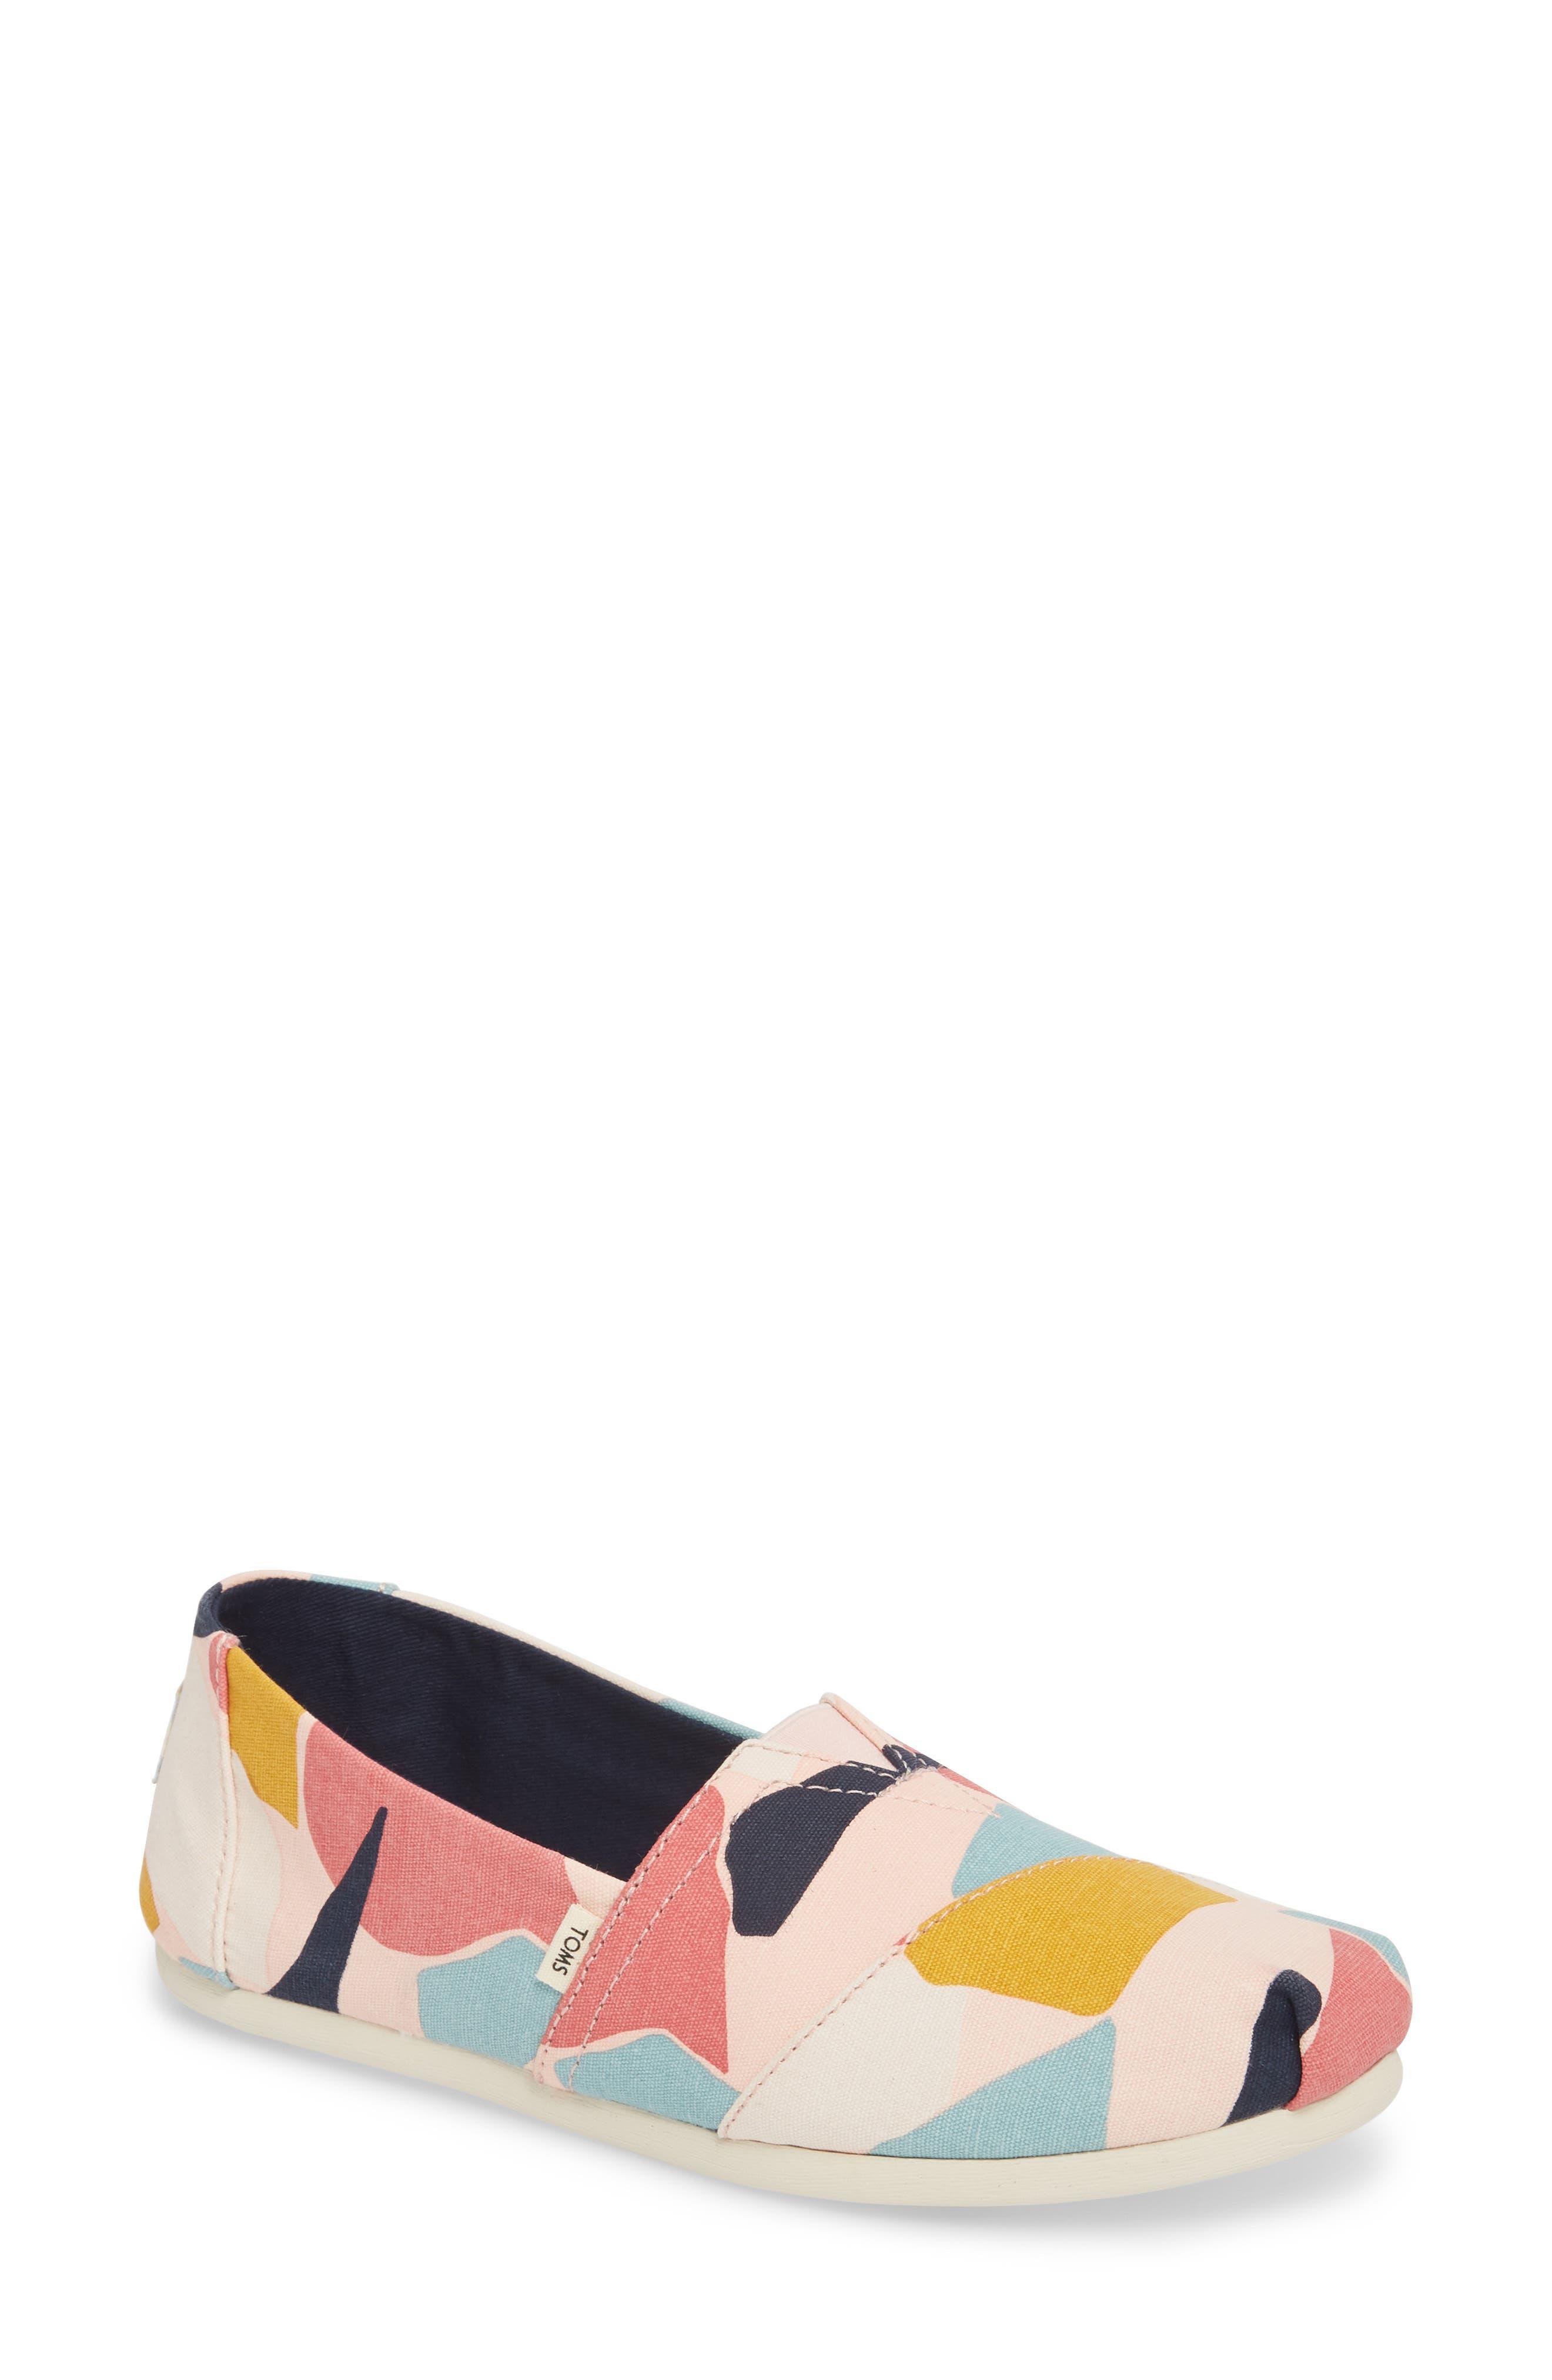 Alpargata Slip-On Sneaker,                             Main thumbnail 1, color,                             ROSE GLOW PRINT CANVAS